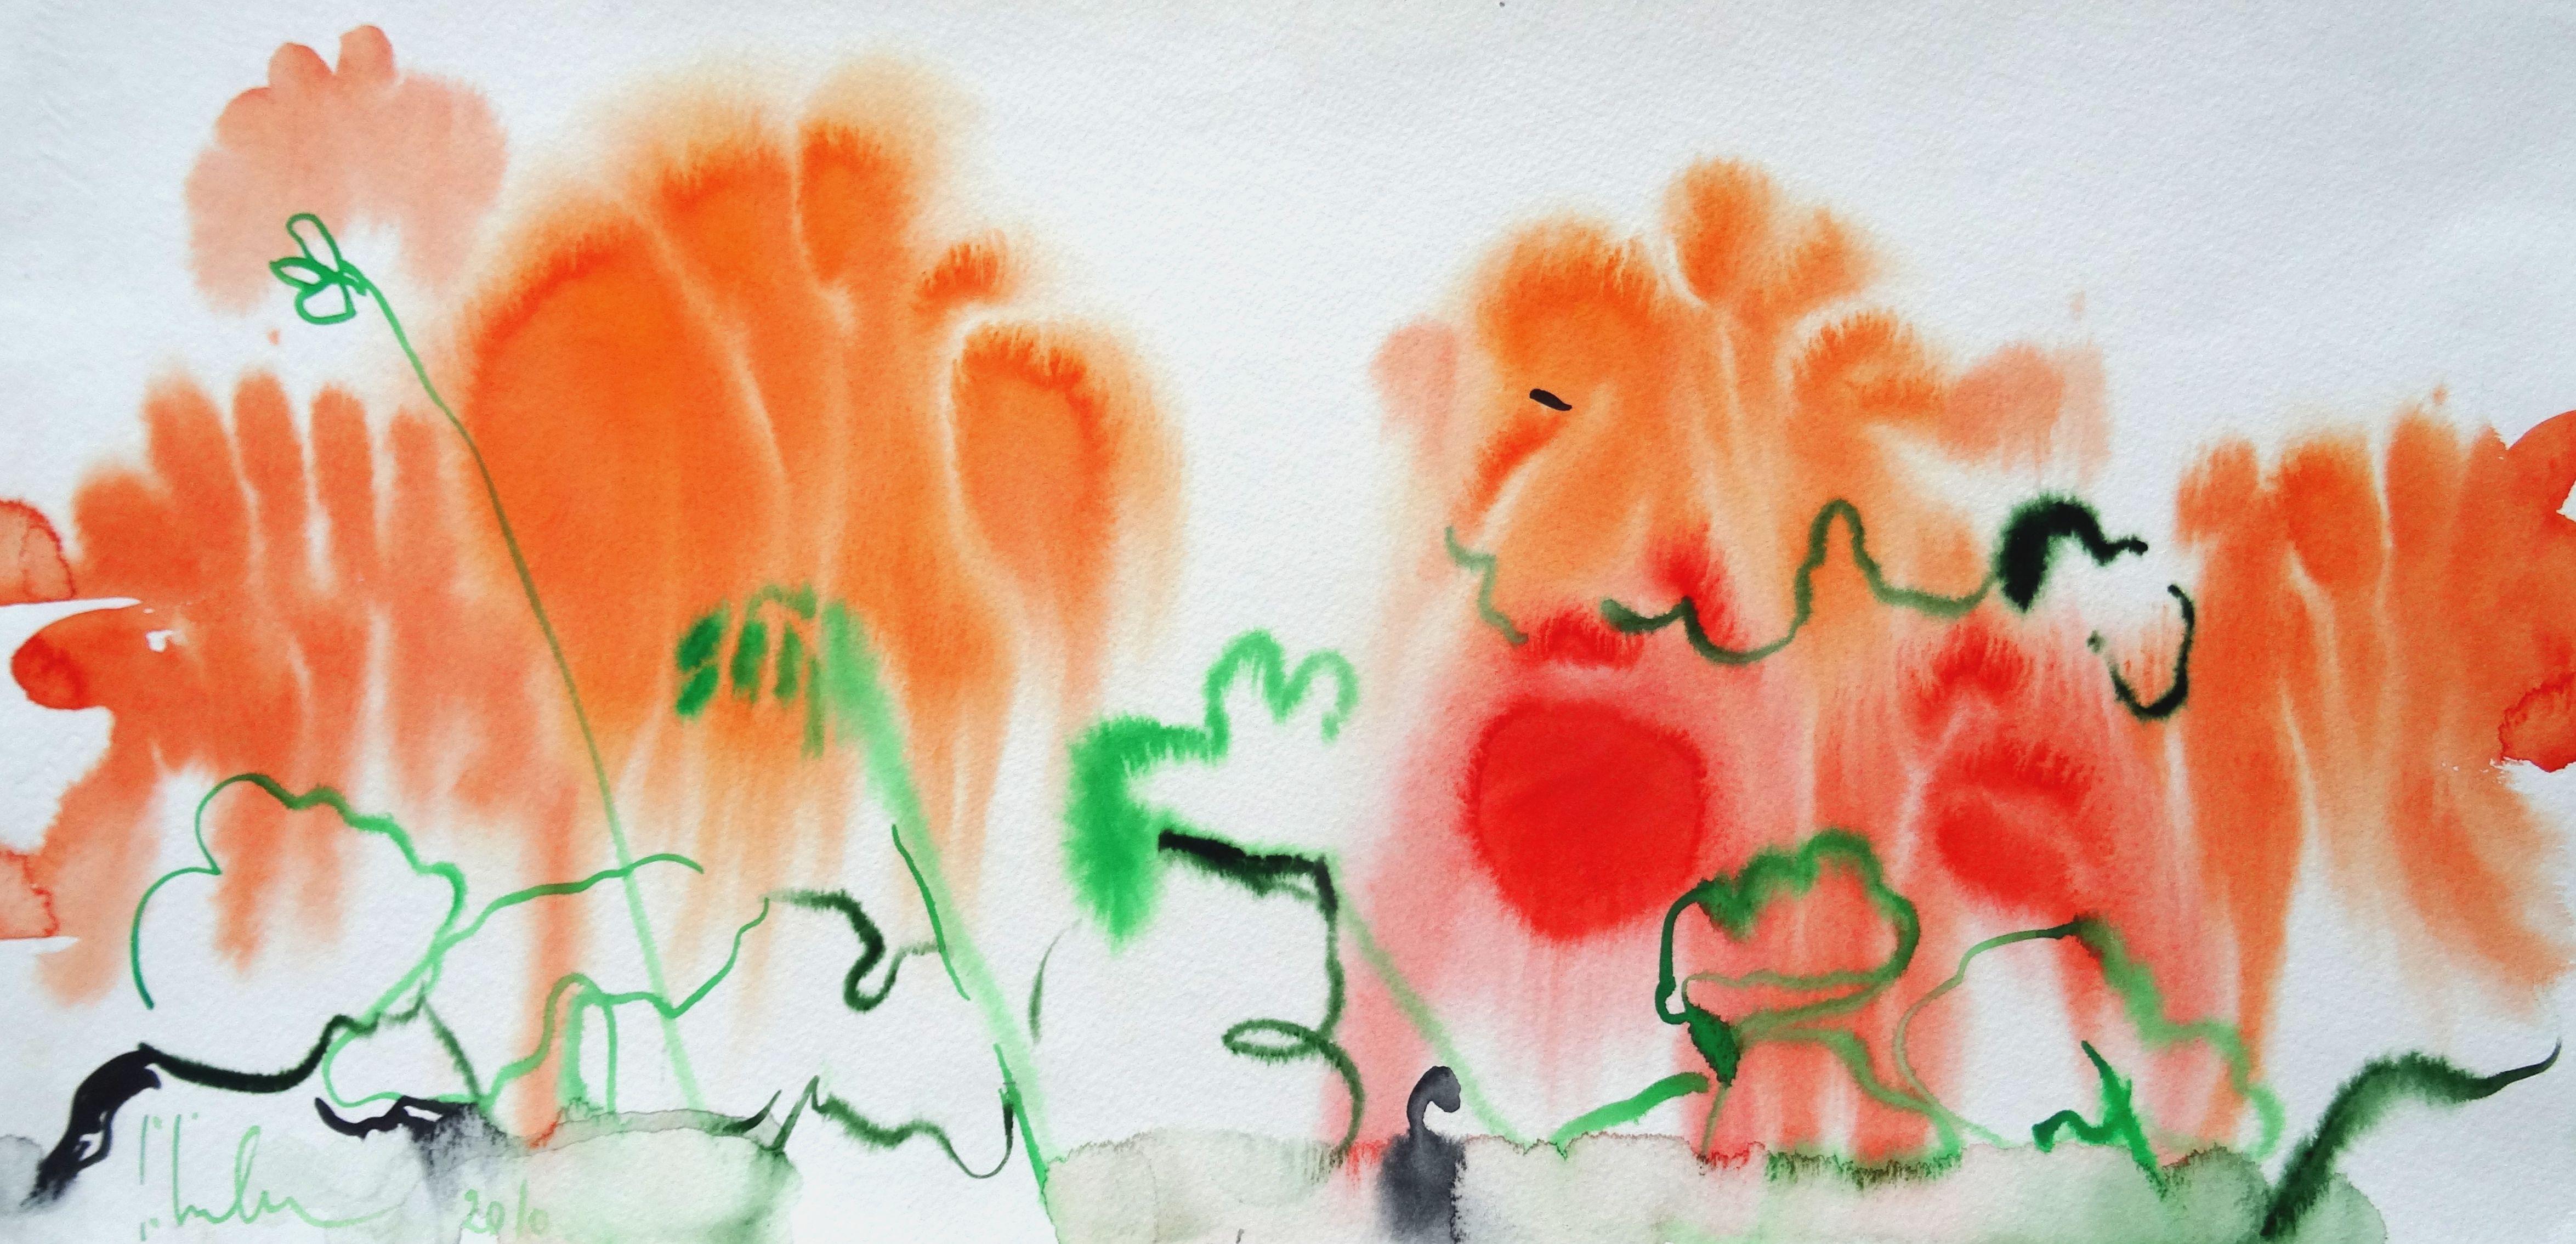 Orange flowers at Tuileries Garden. Paris 2010. Watercolor on paper, 24x50 cm